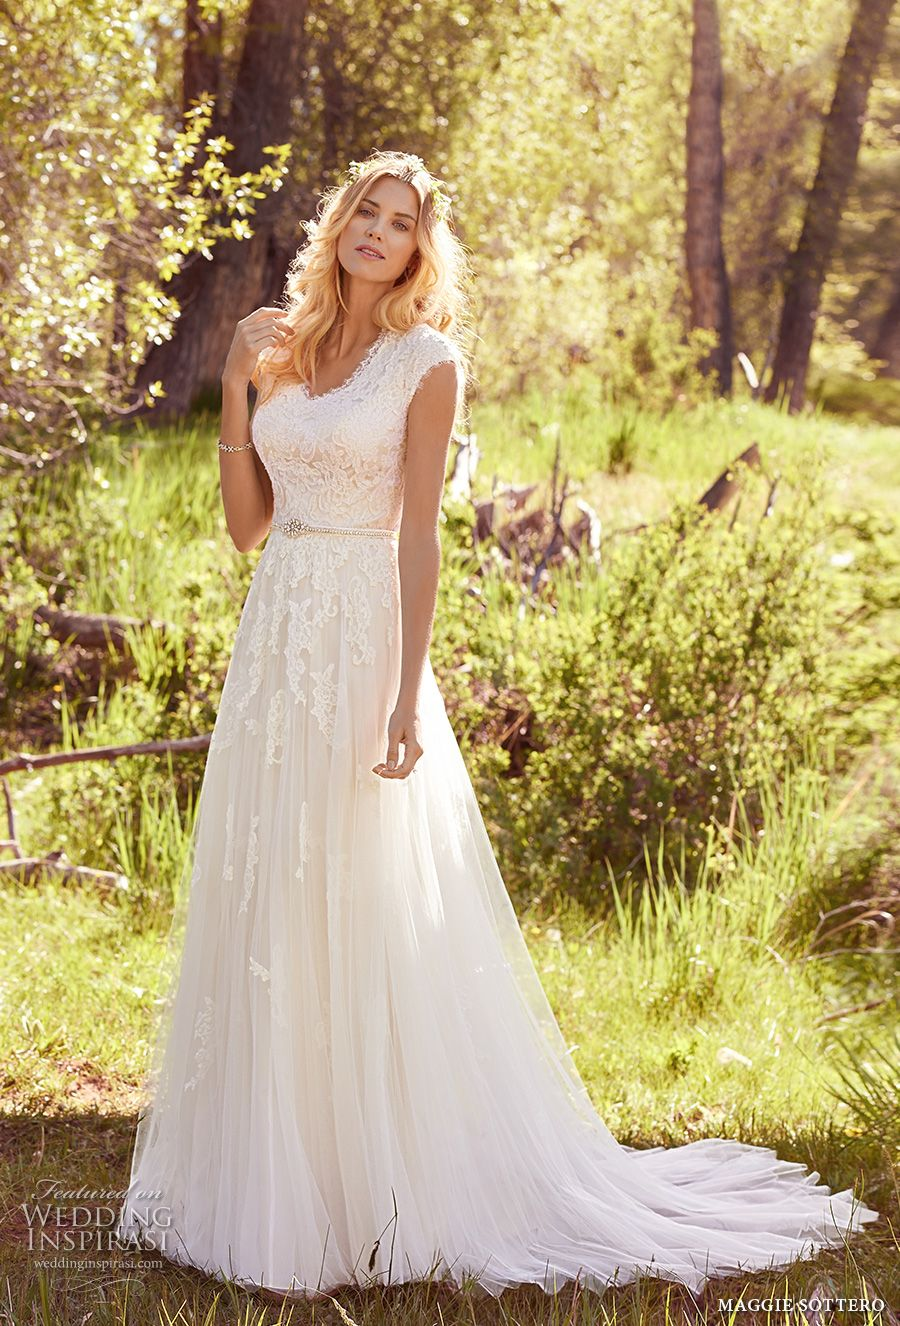 Maggie Sottero Spring 2017 Wedding Dresses Avery Bridal